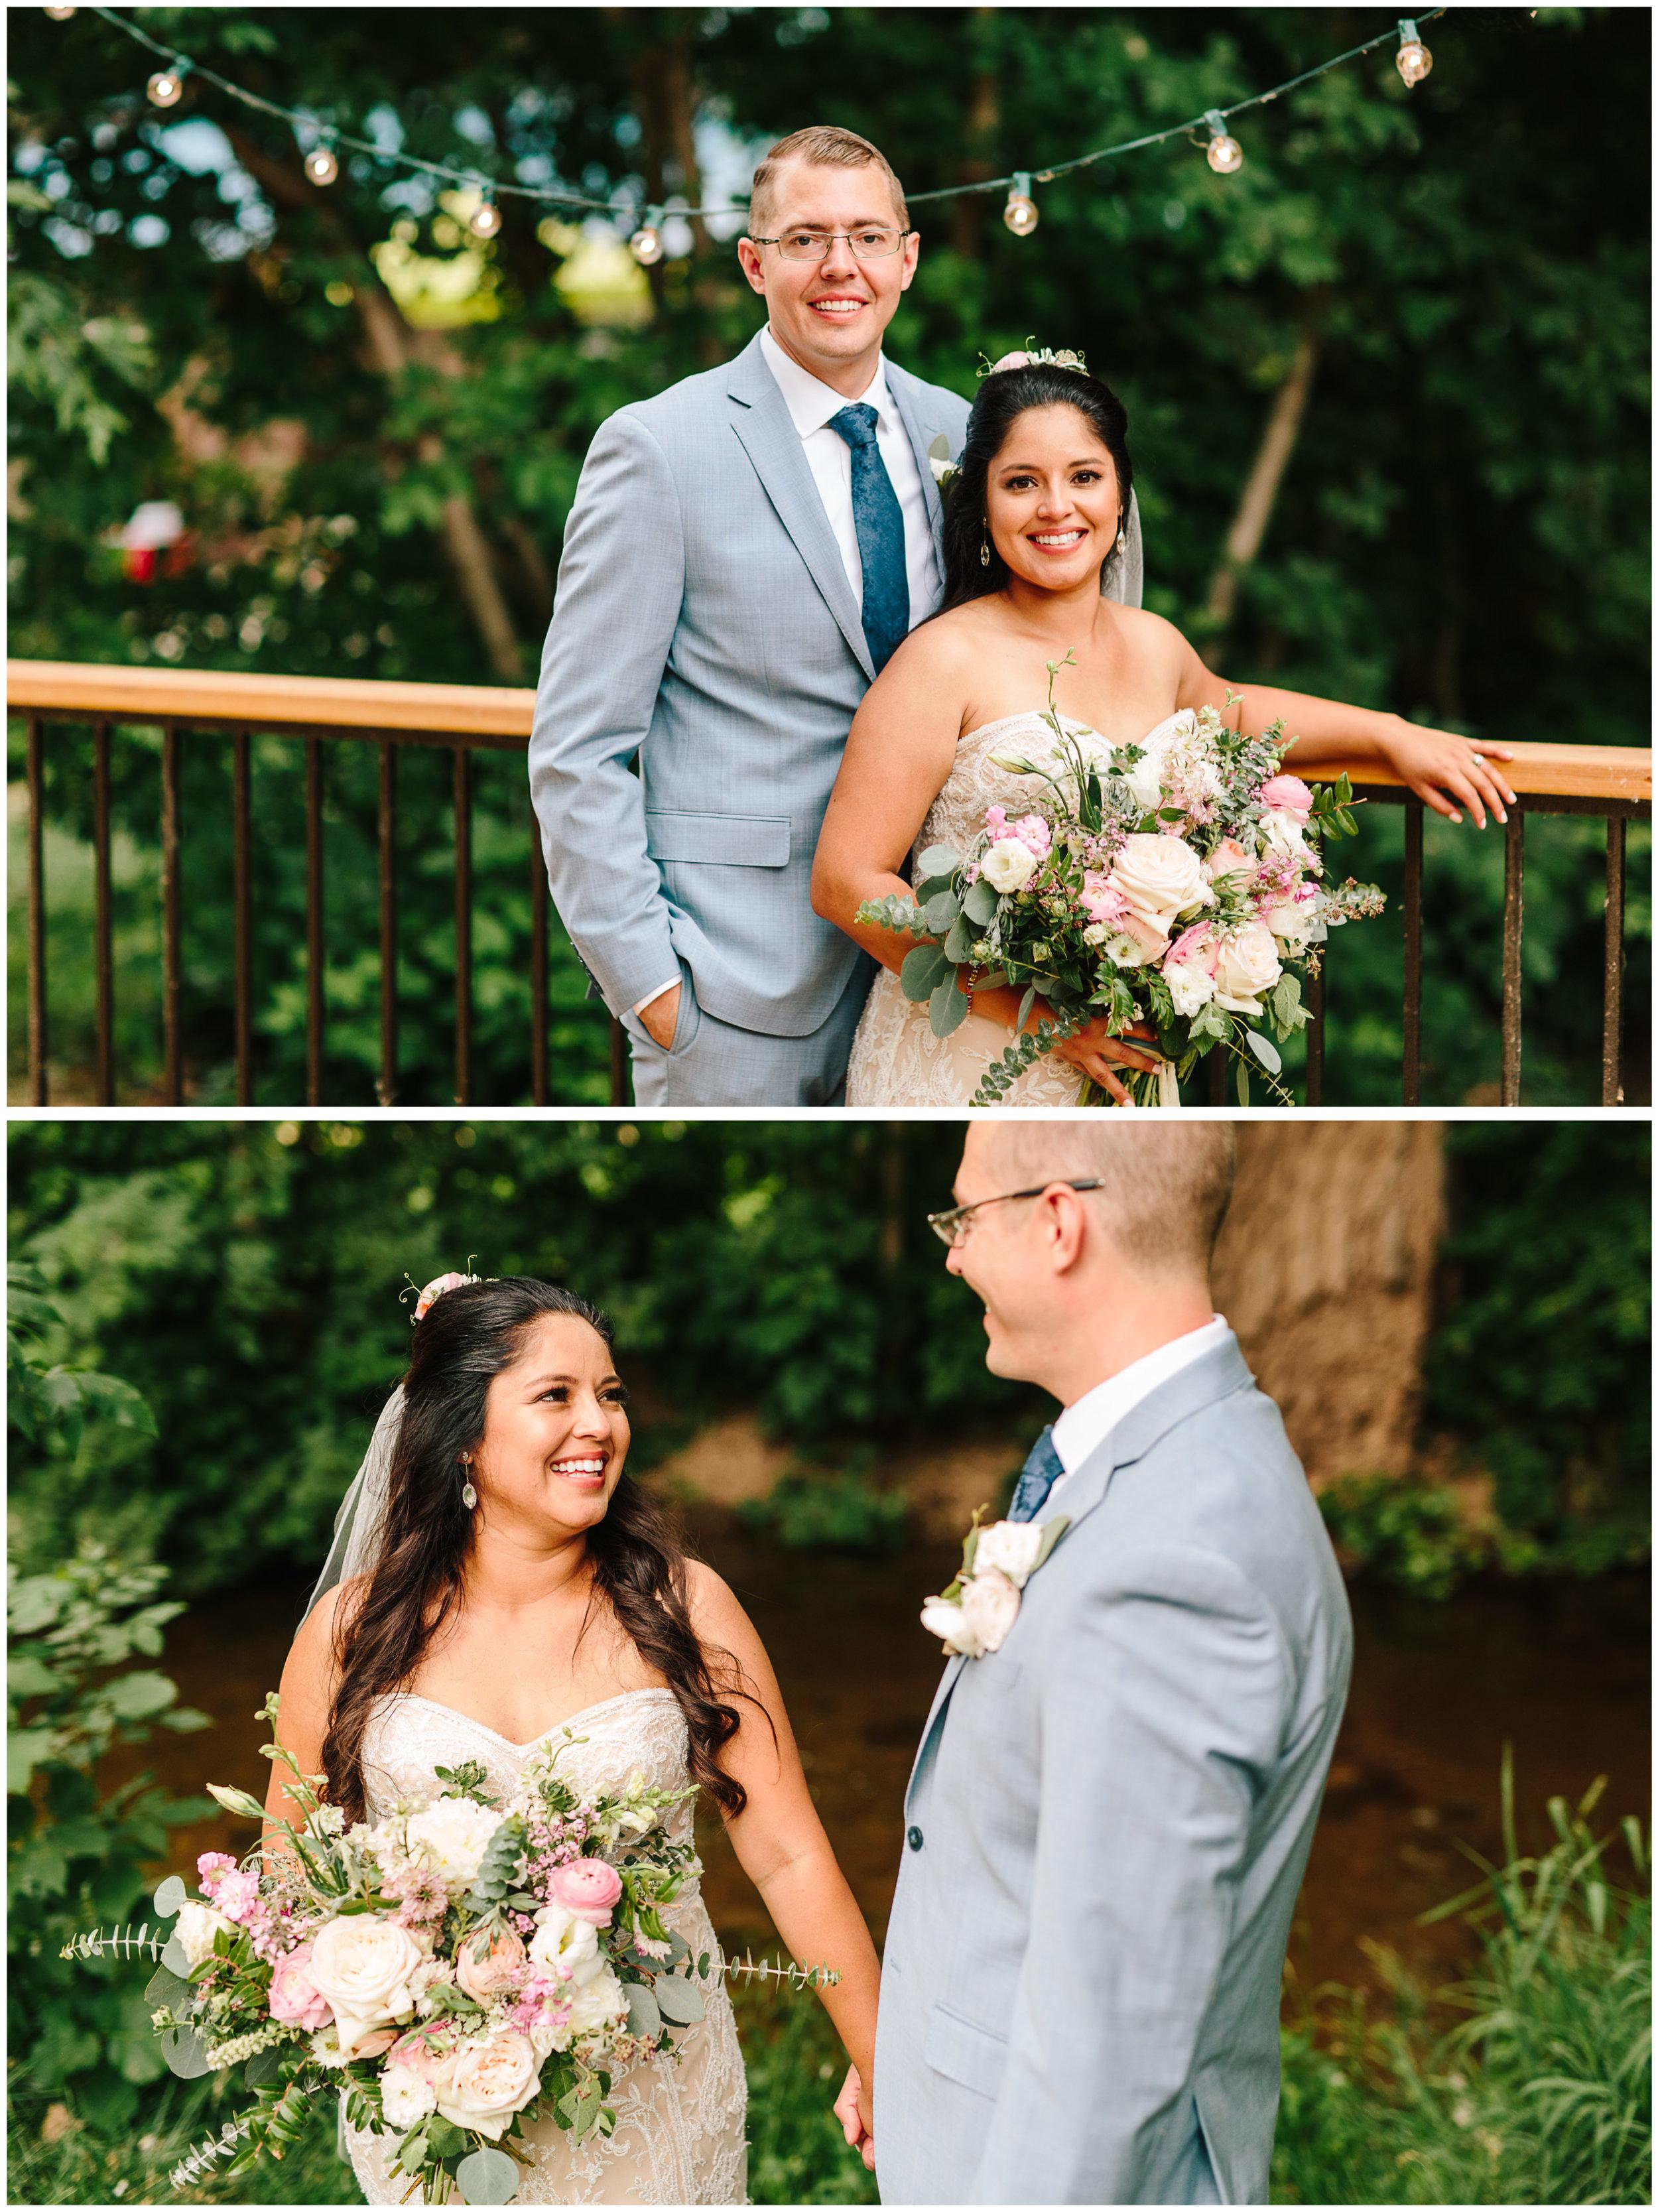 lyons_farmette_wedding_43.jpg